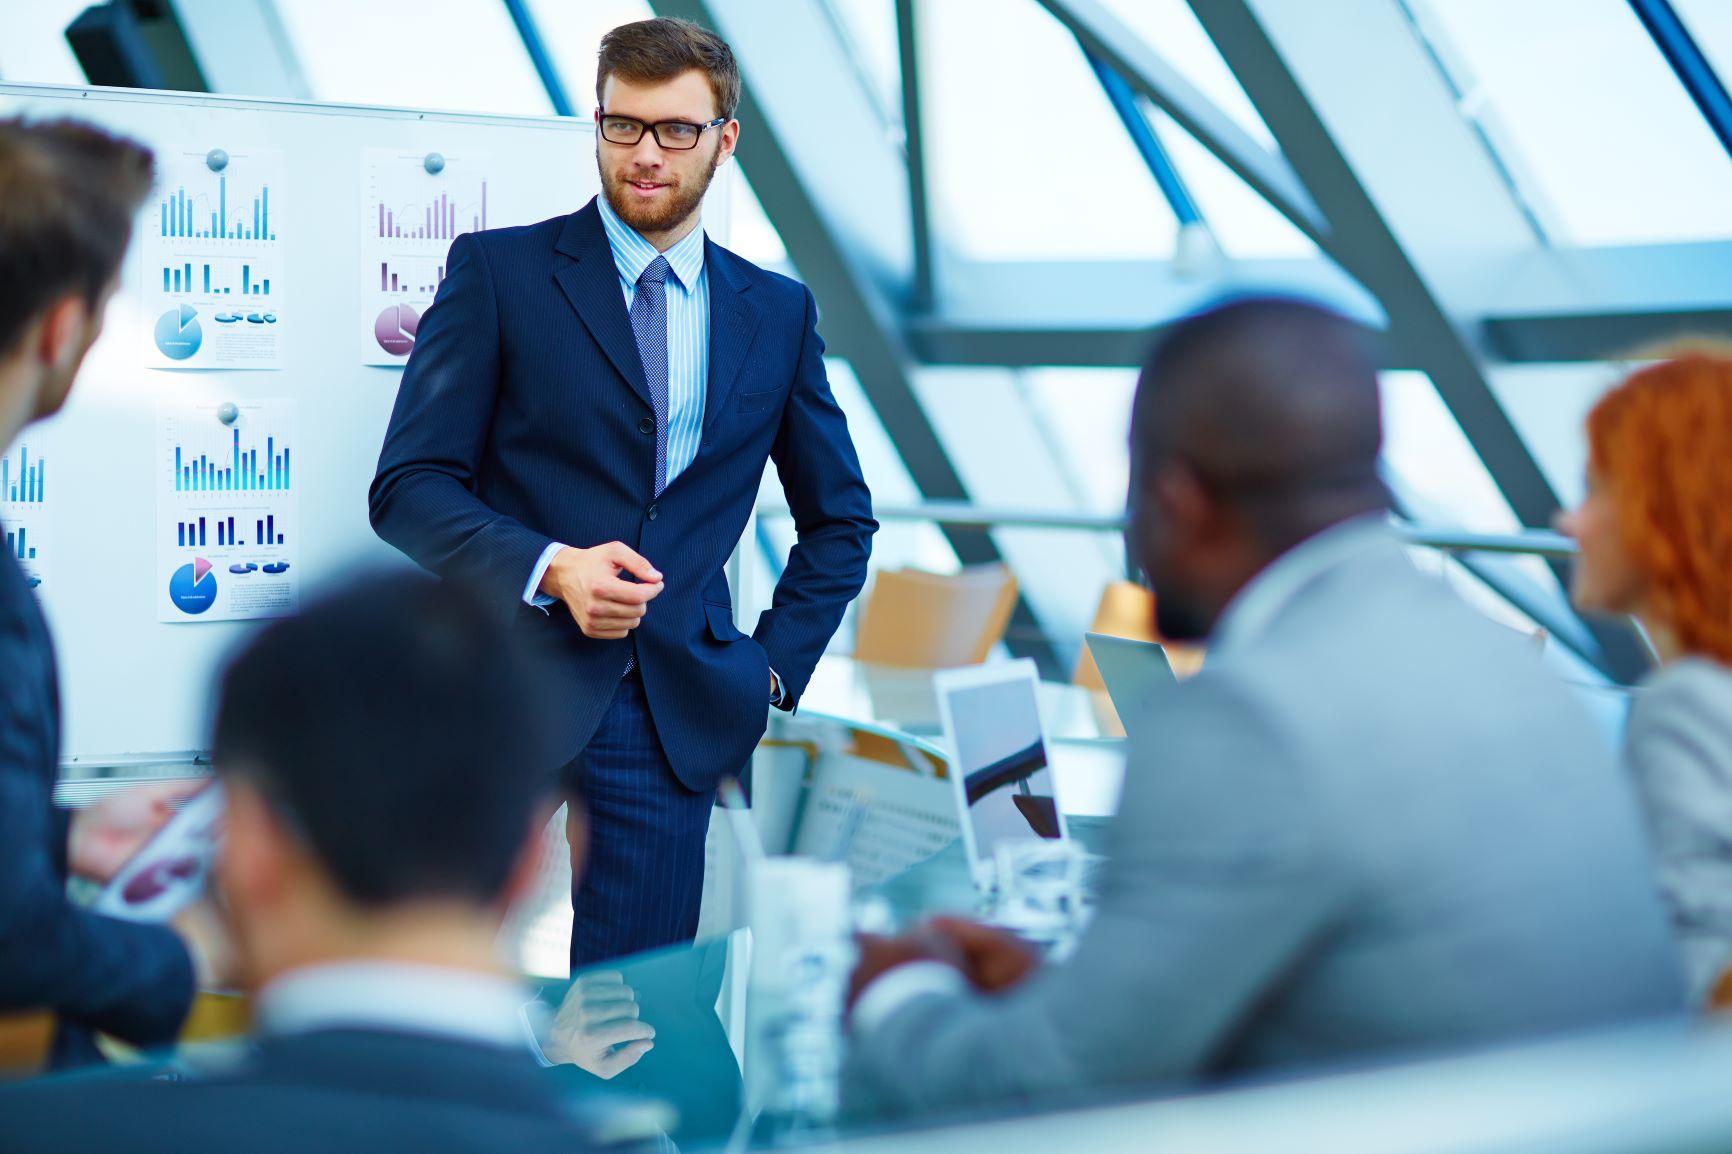 Managing a successful sales team